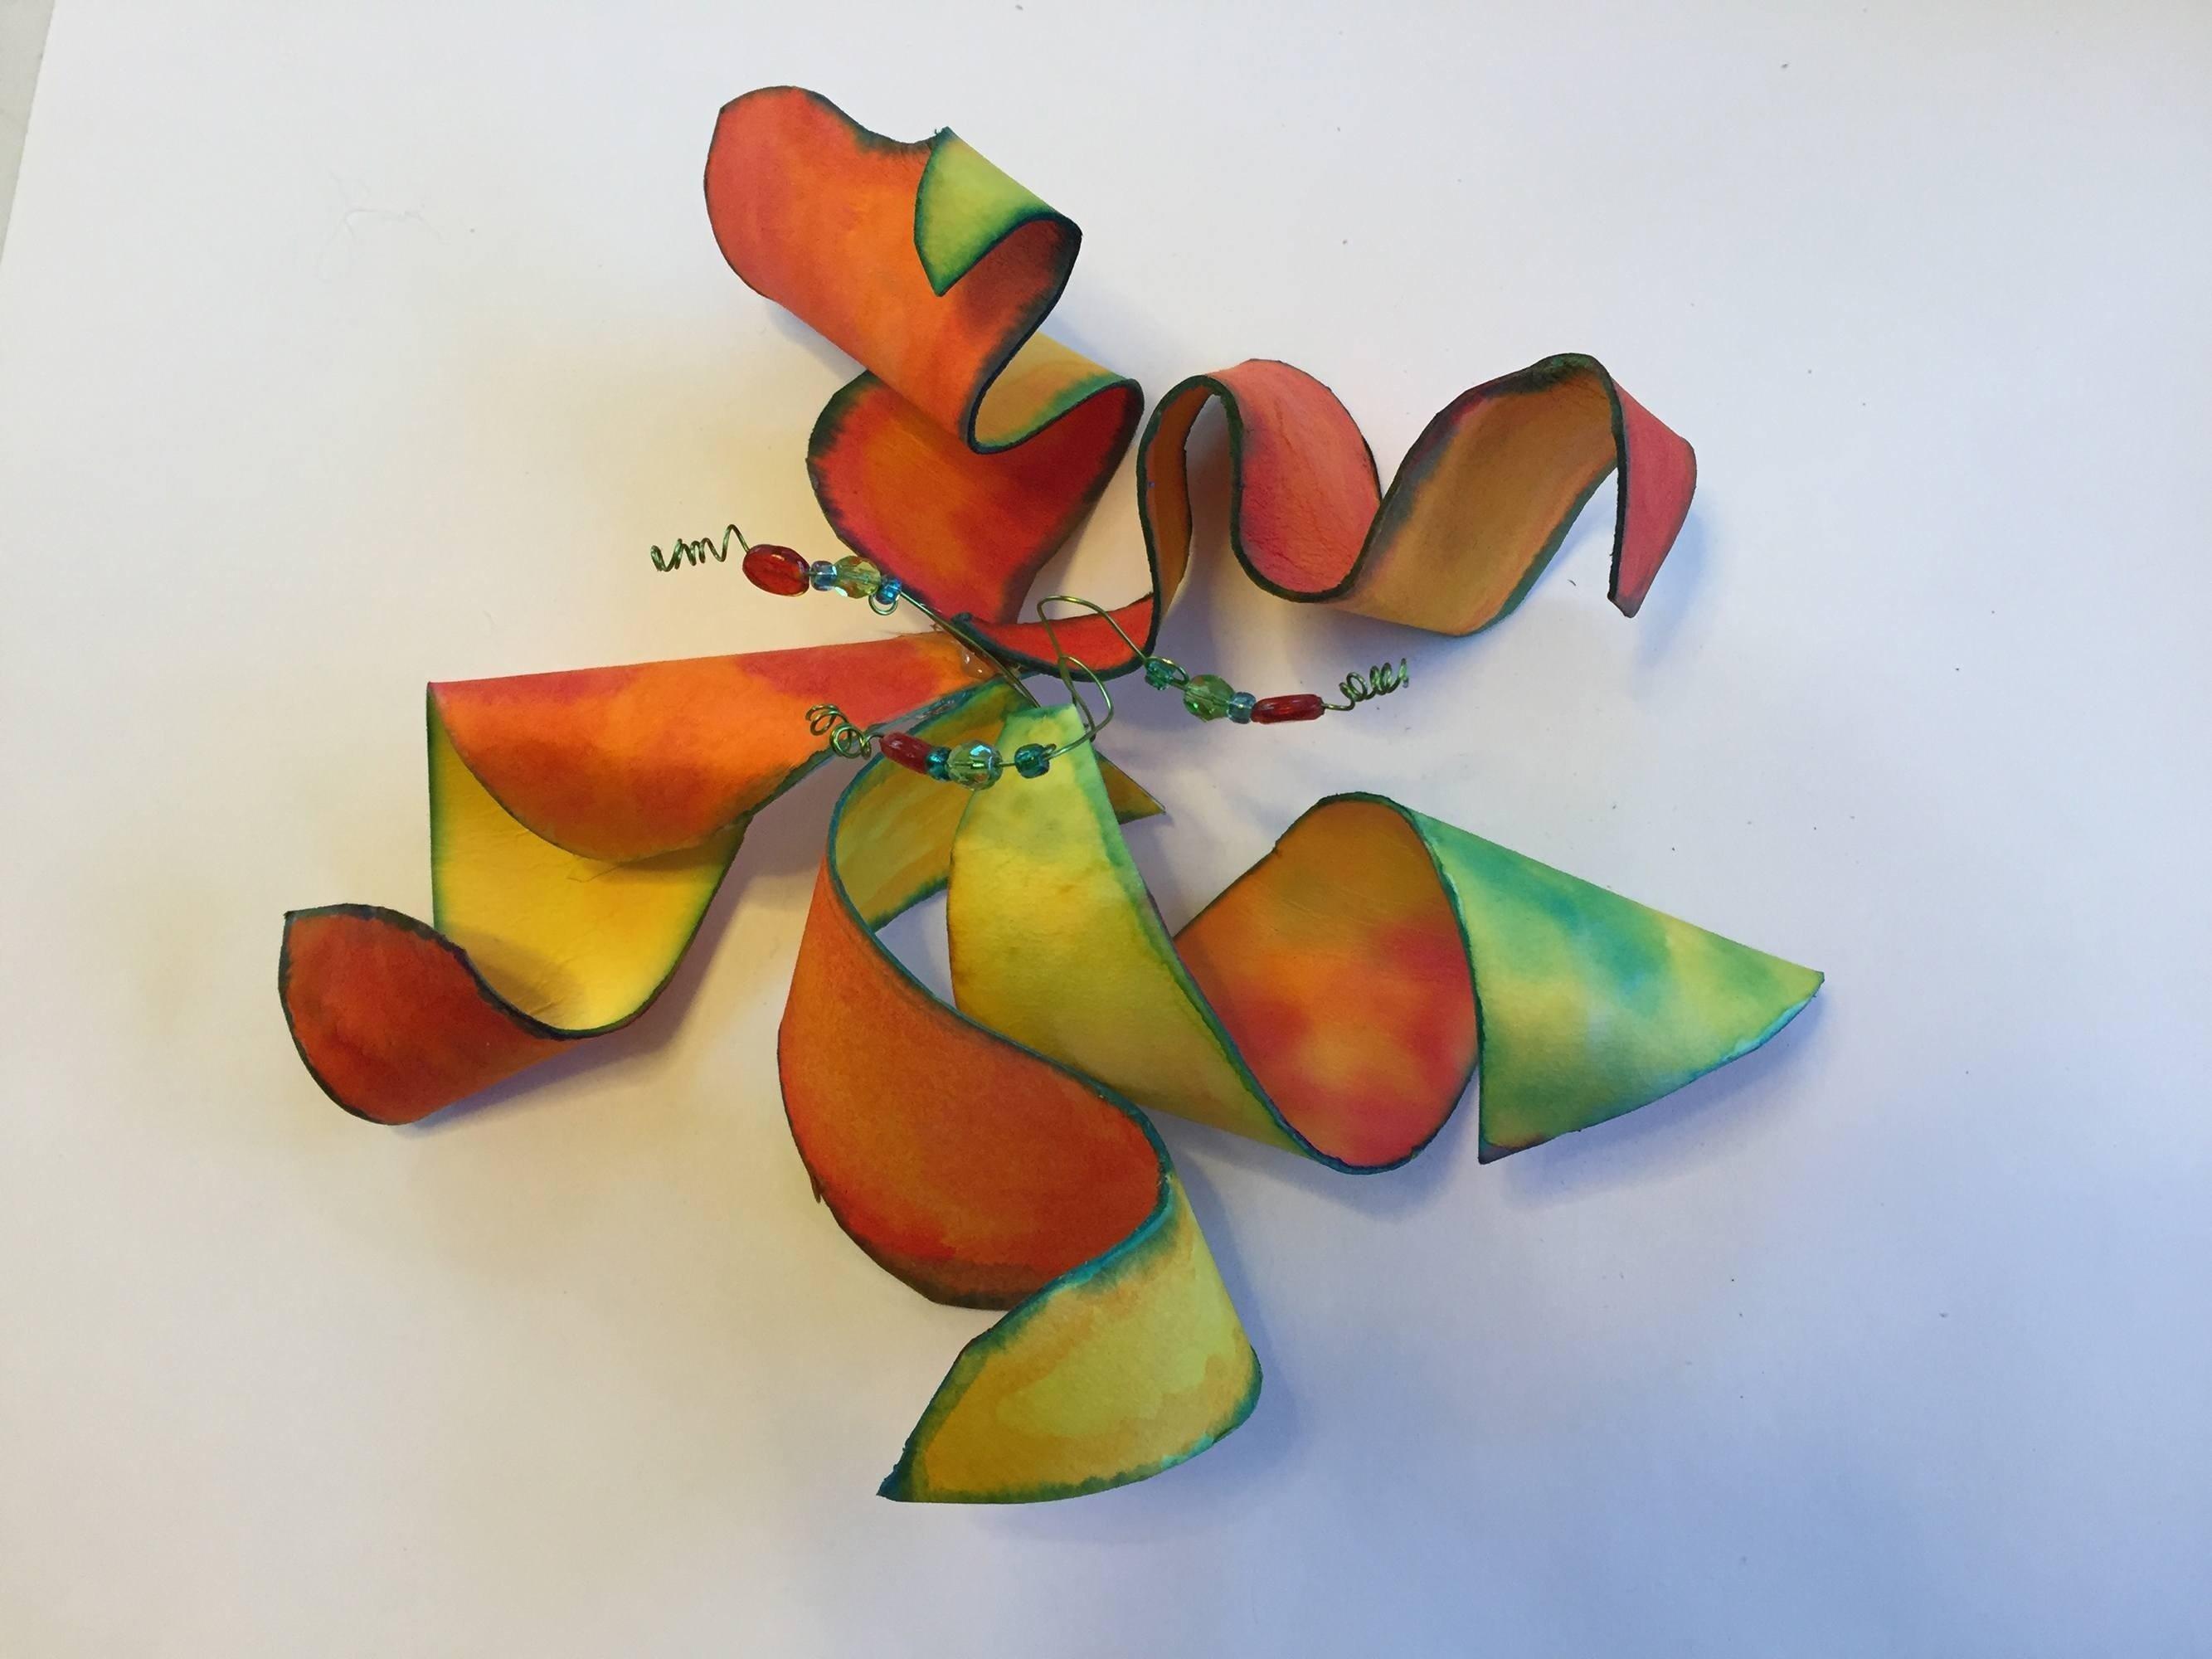 Water color k12 art project flower